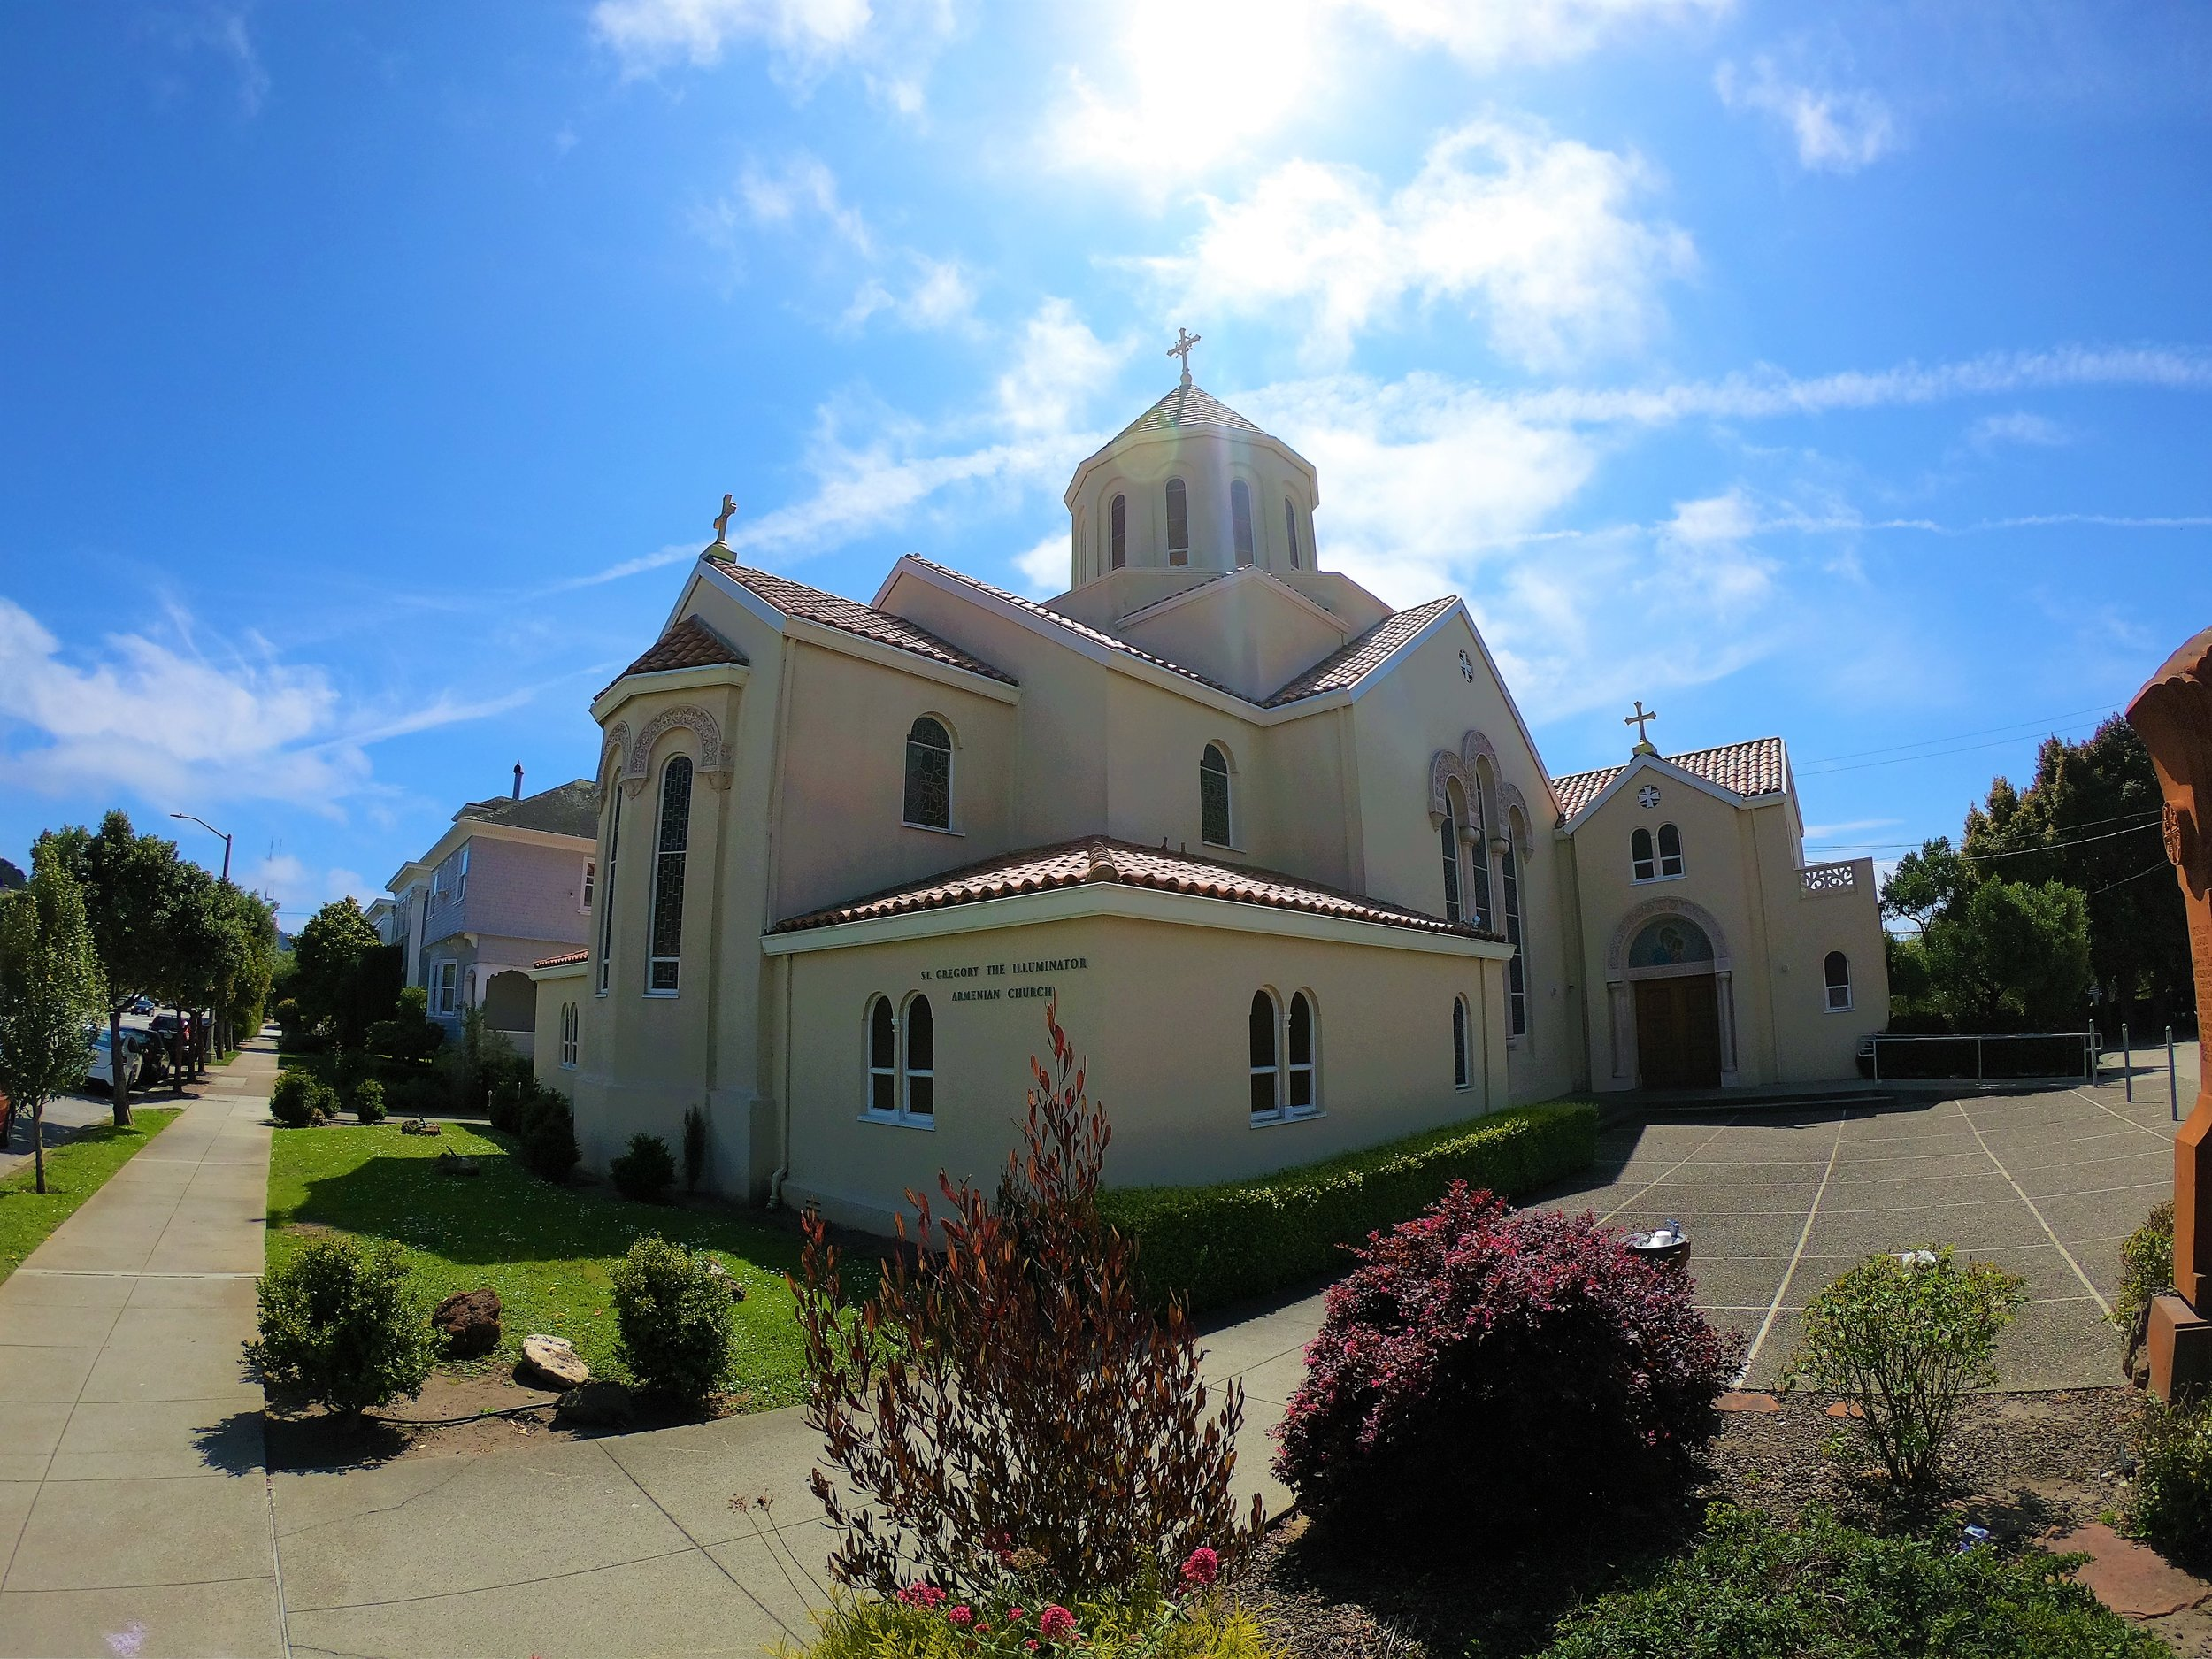 St. Gregory the Illuminator Armenian Church in San Francisco, California